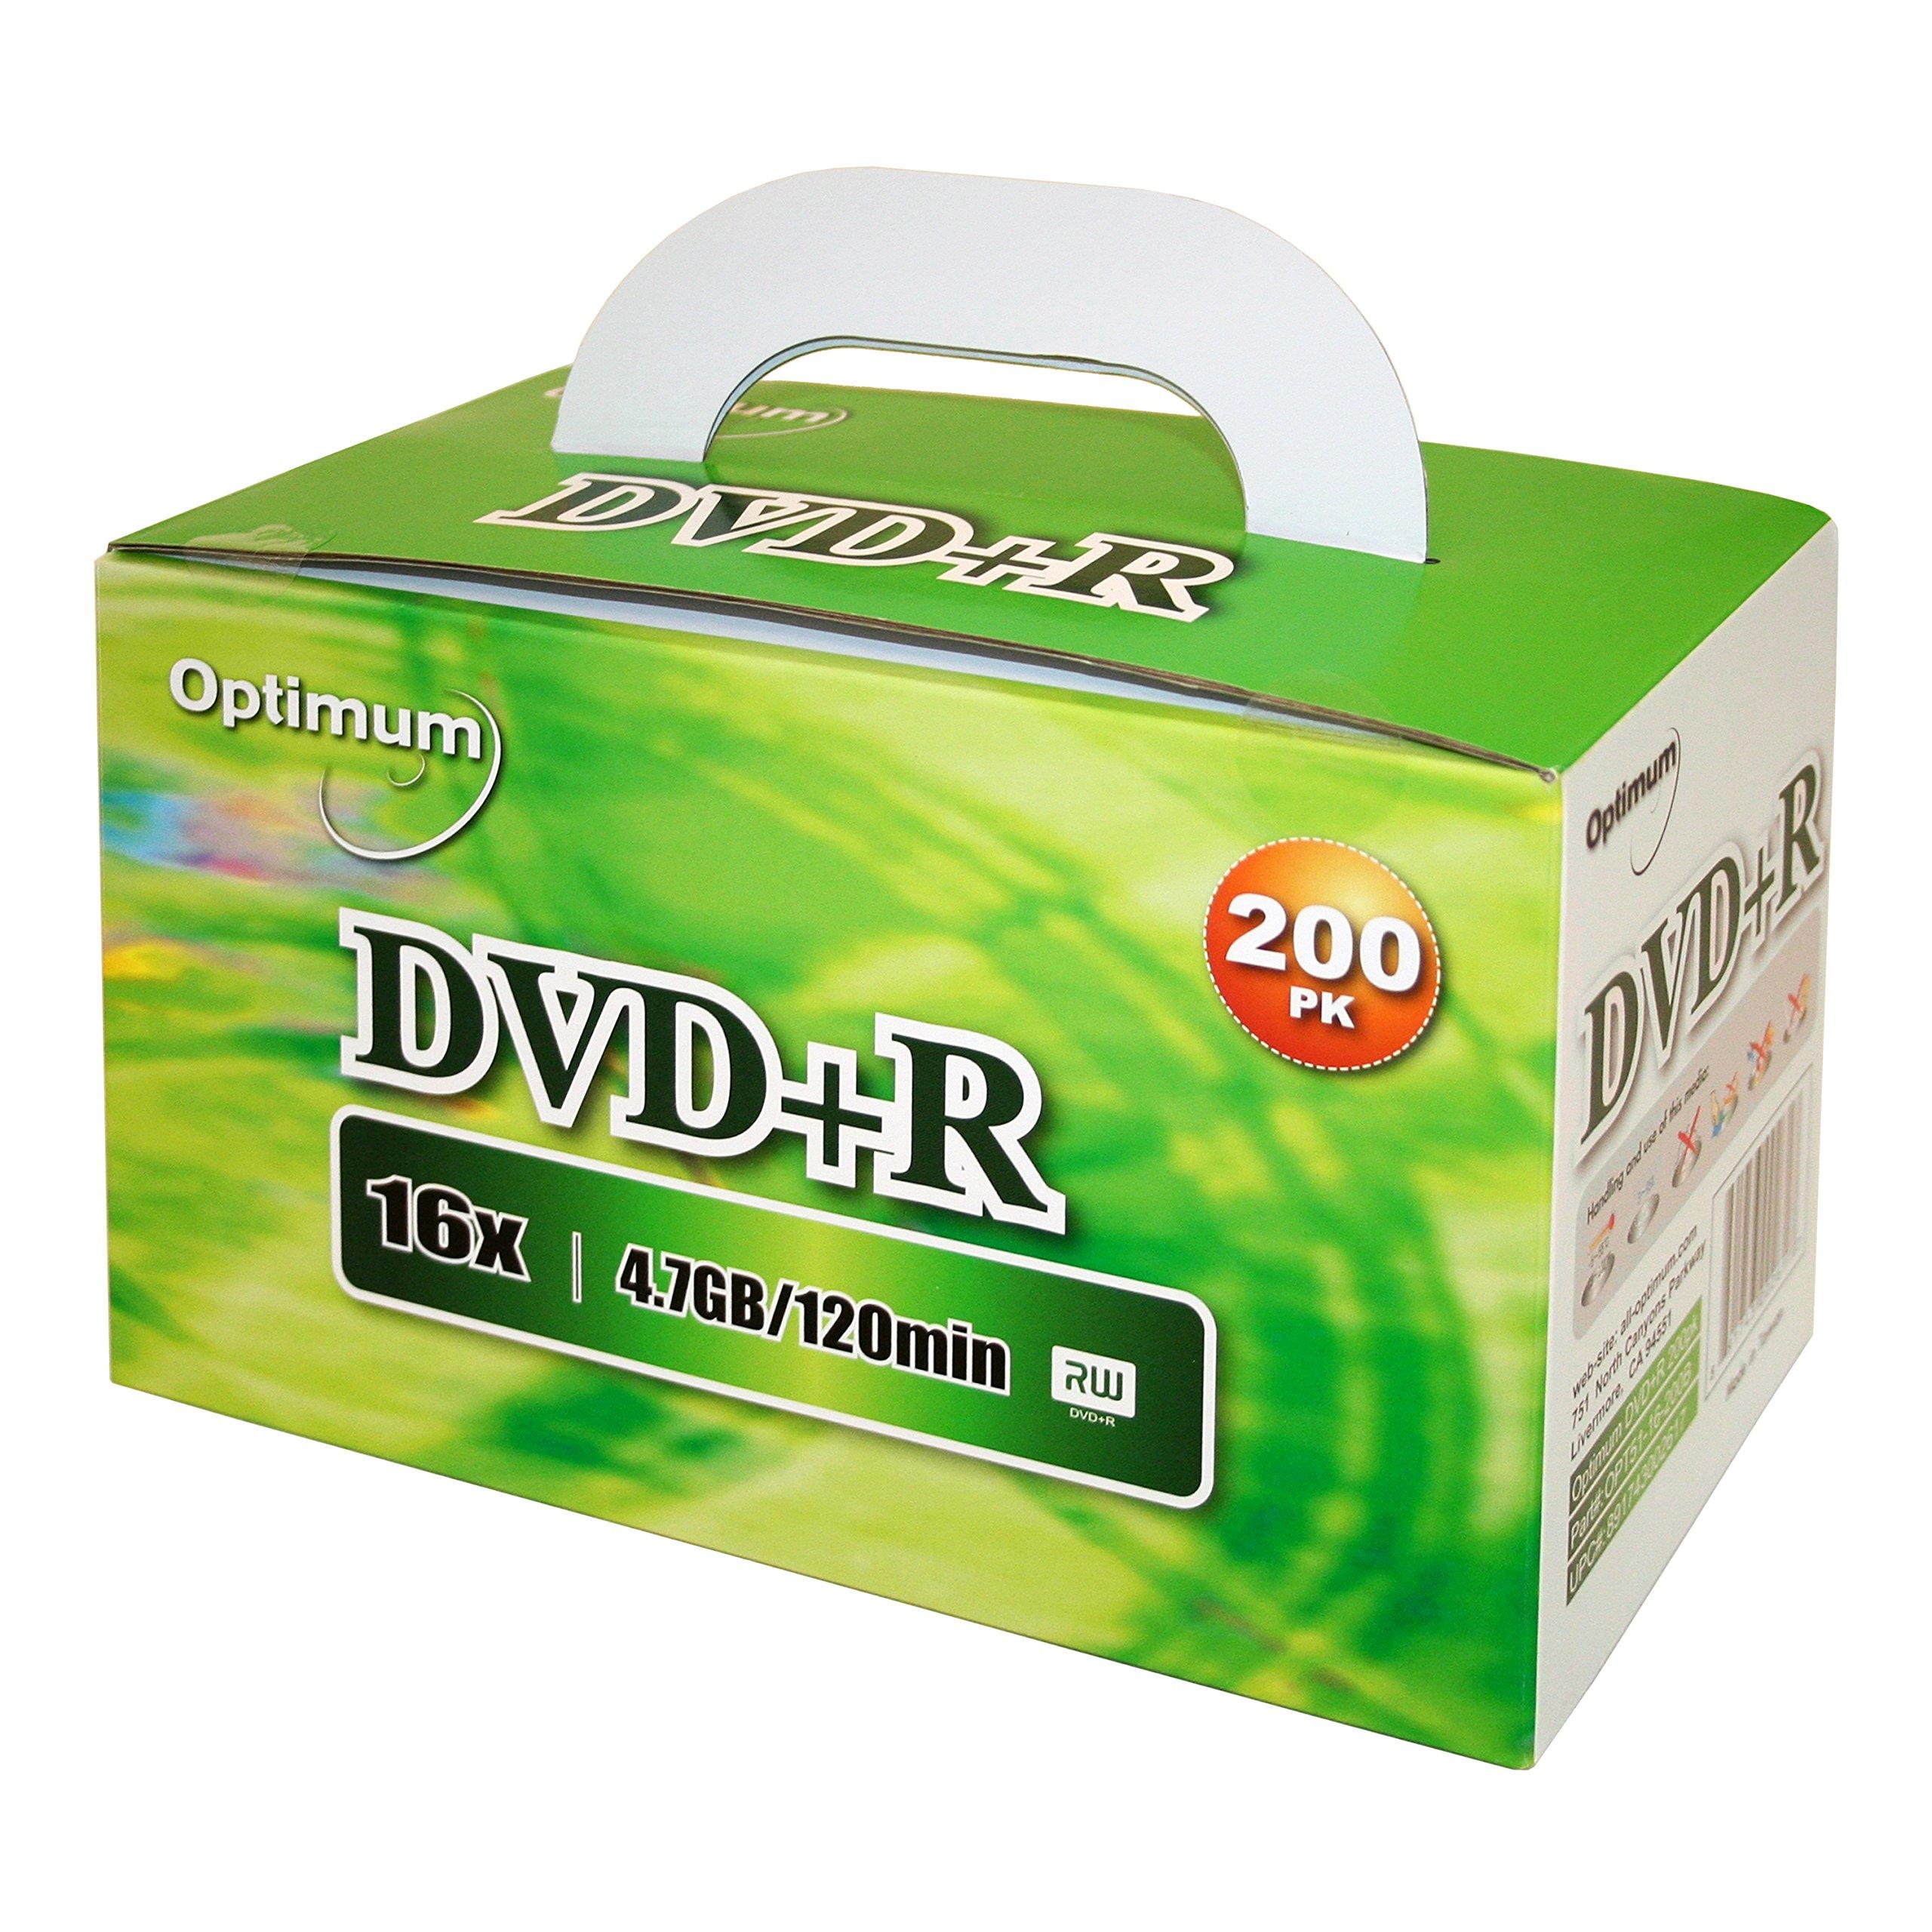 Optimum DVD+R 16x 4.7GB / 120min Logo Top 200pk